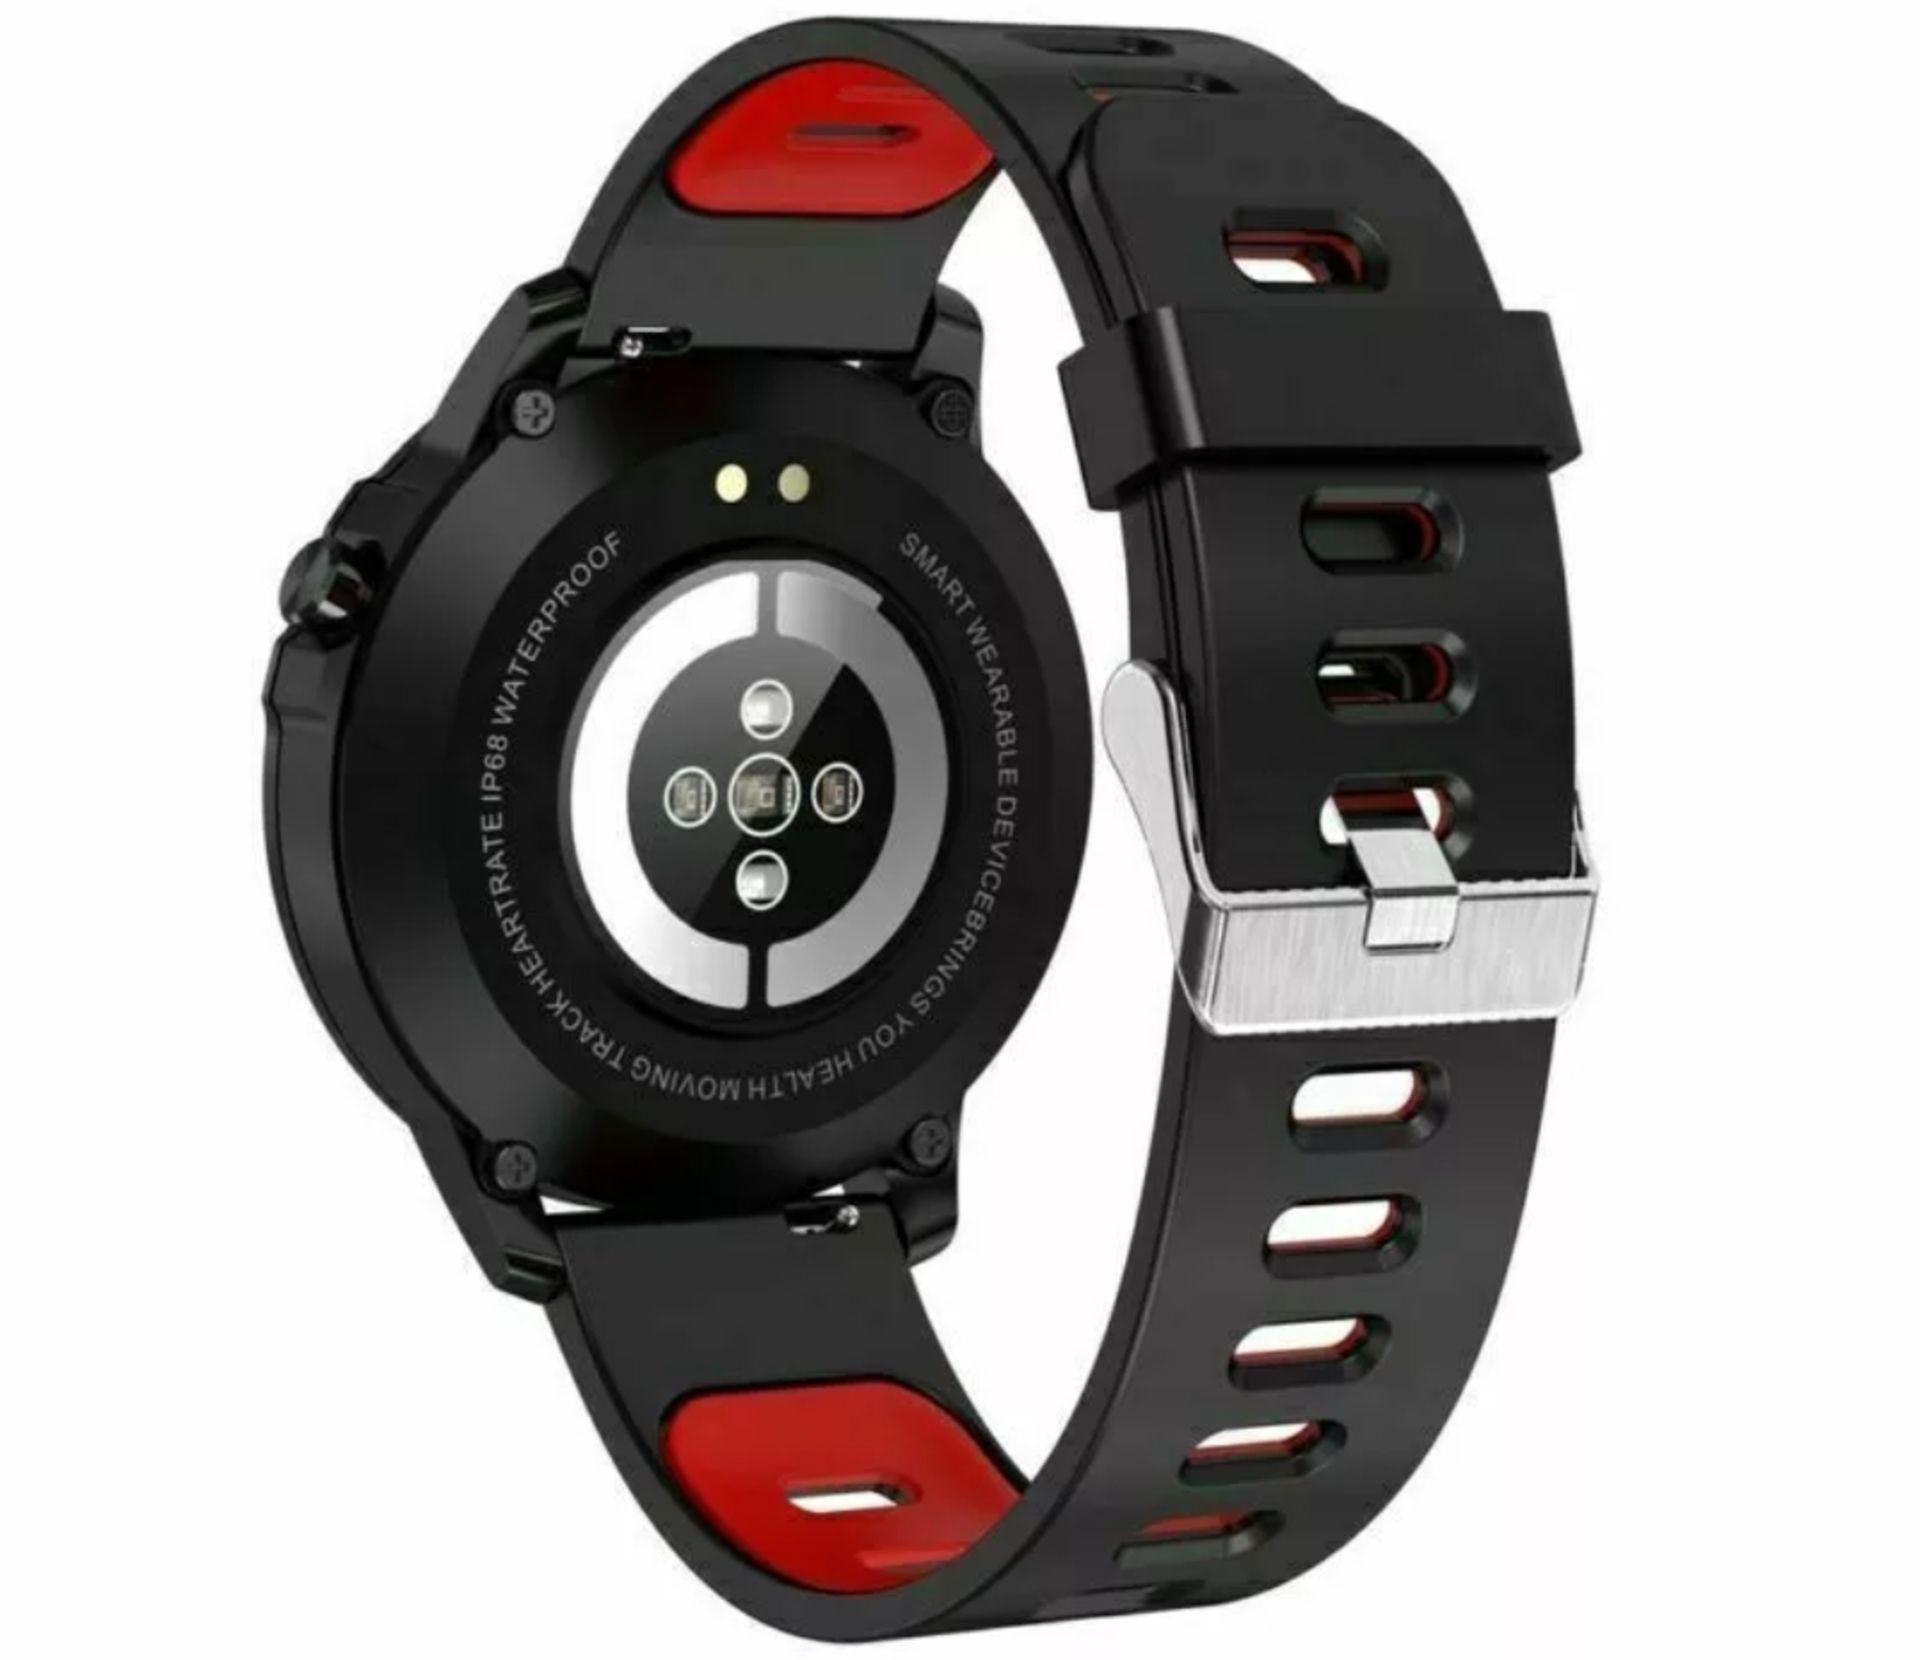 Lot 155 - L8 Blood Pressure, Oxygen, Heart Rate Monitor, Bt4.0 Ip68 Smart Watch - Grey/Black Strap